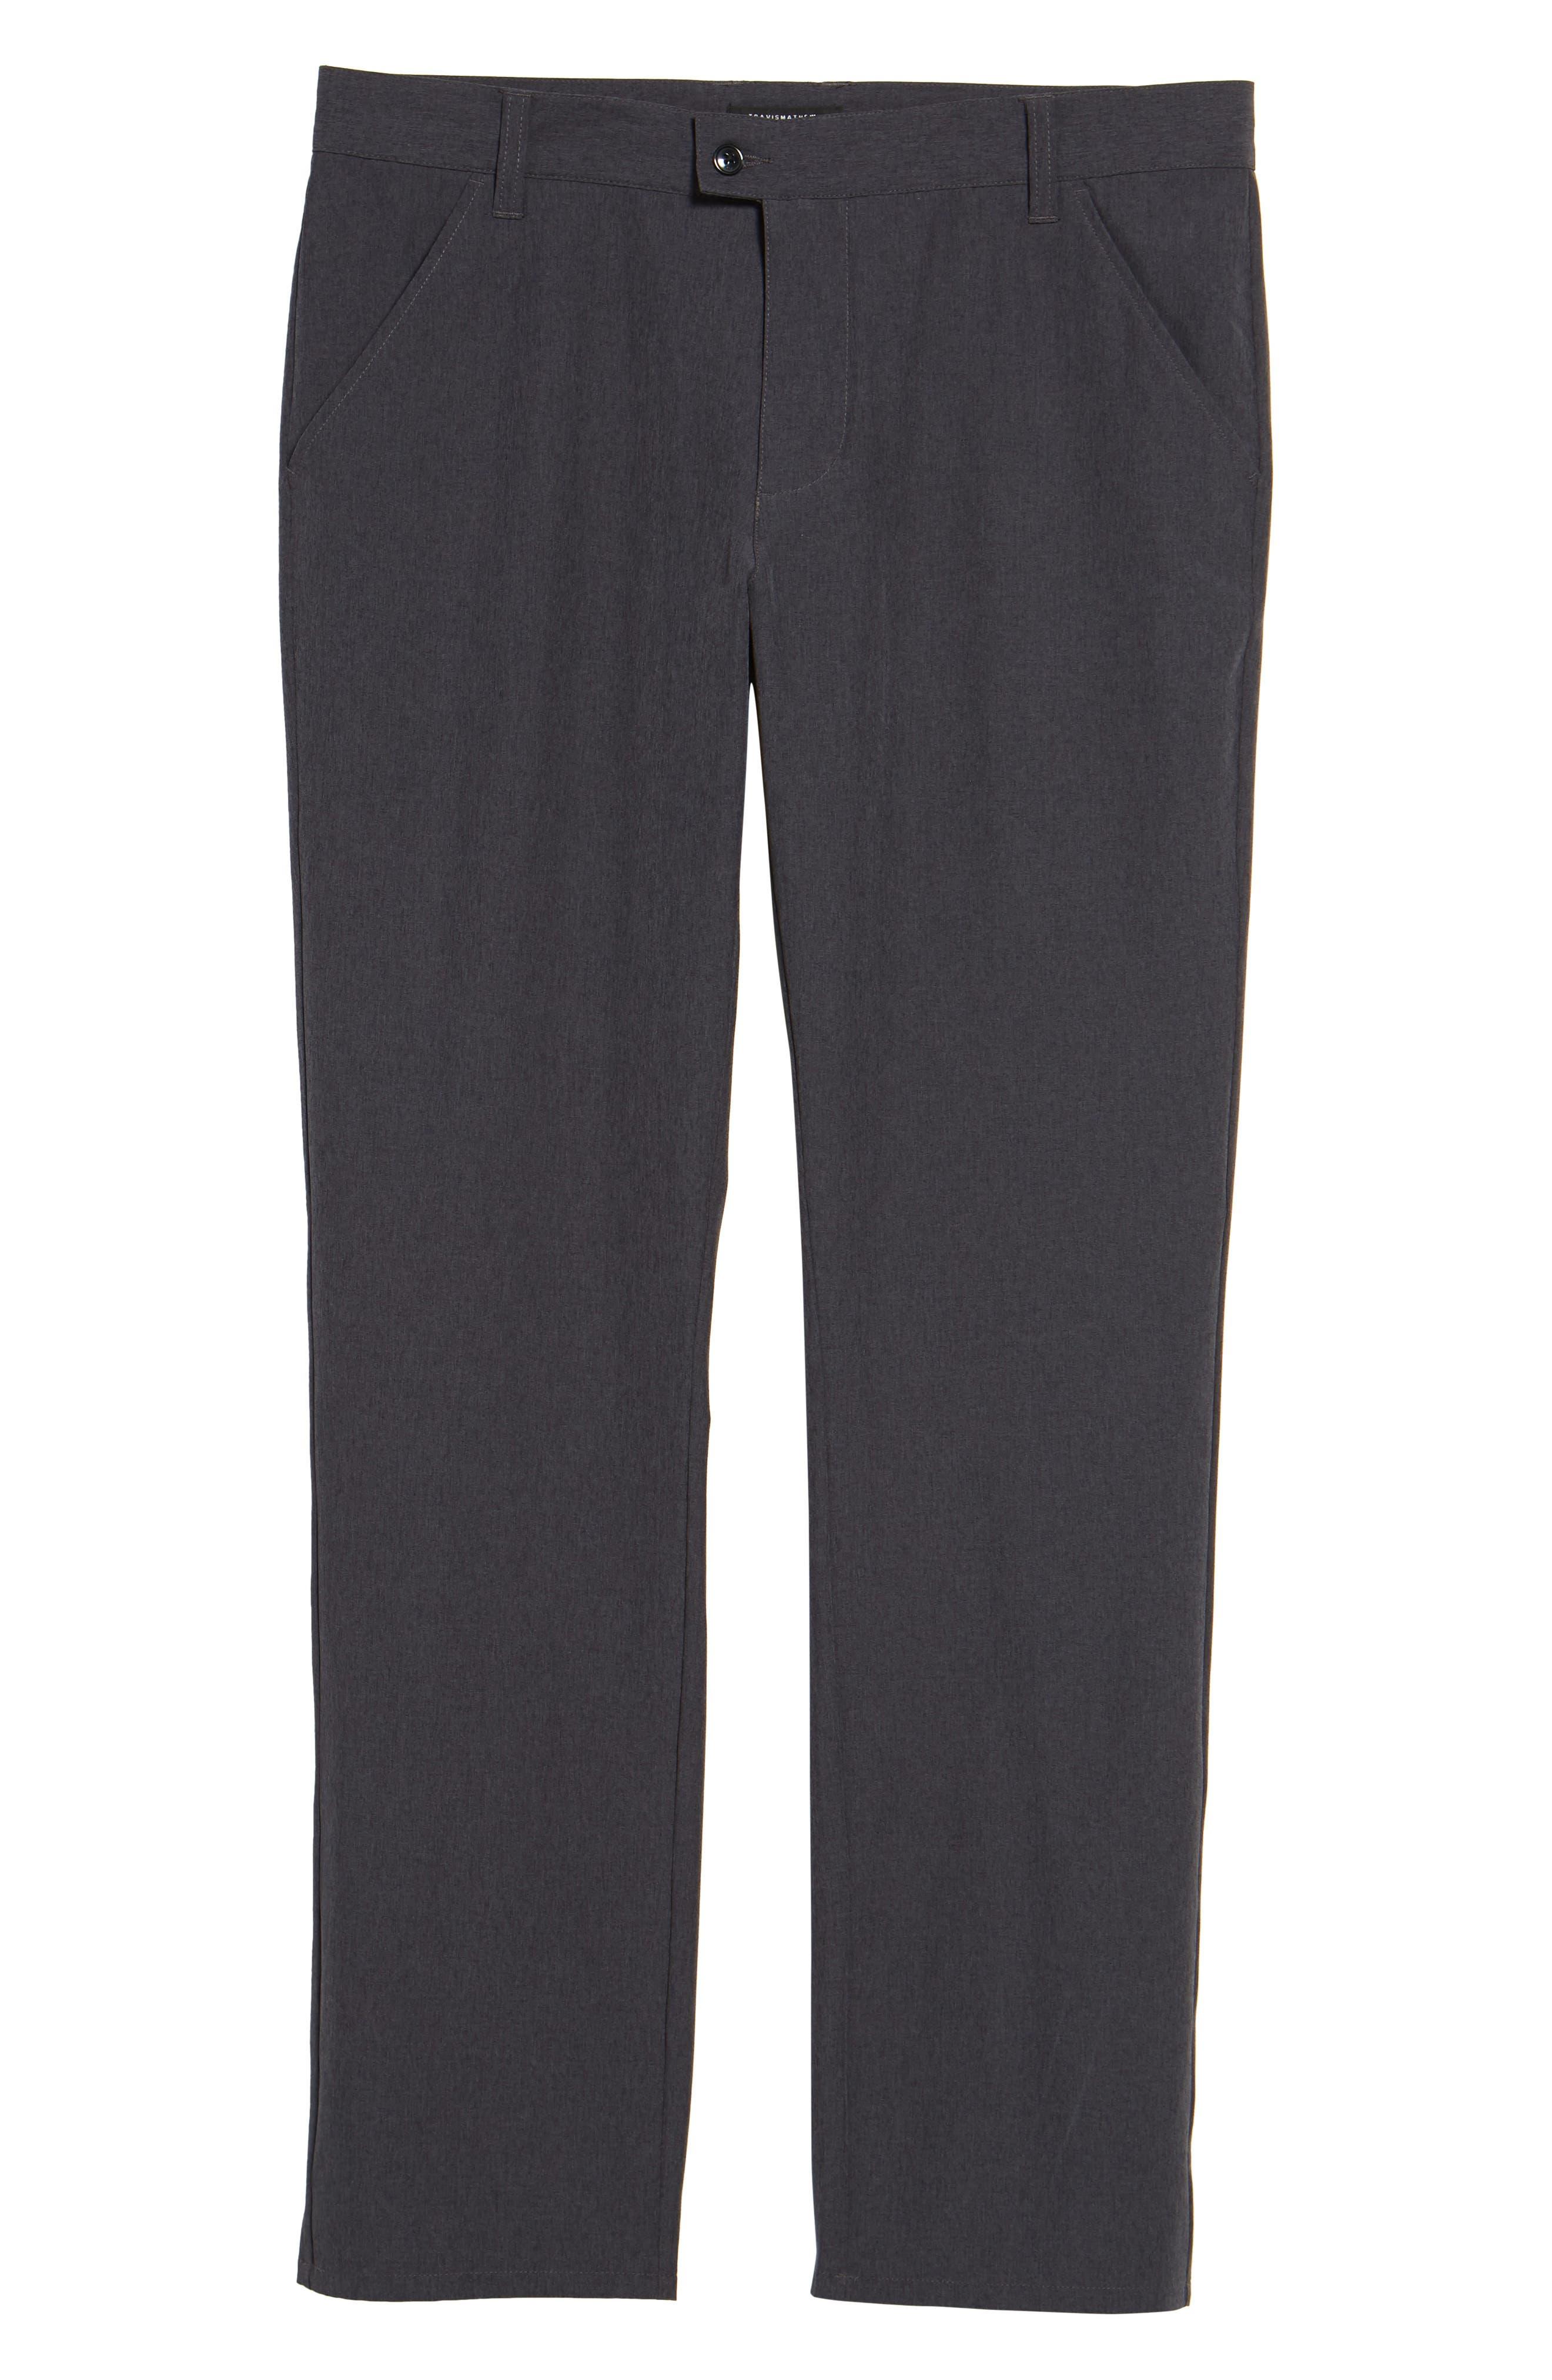 Pantladdium Pants,                             Alternate thumbnail 6, color,                             HEATHER BLACK